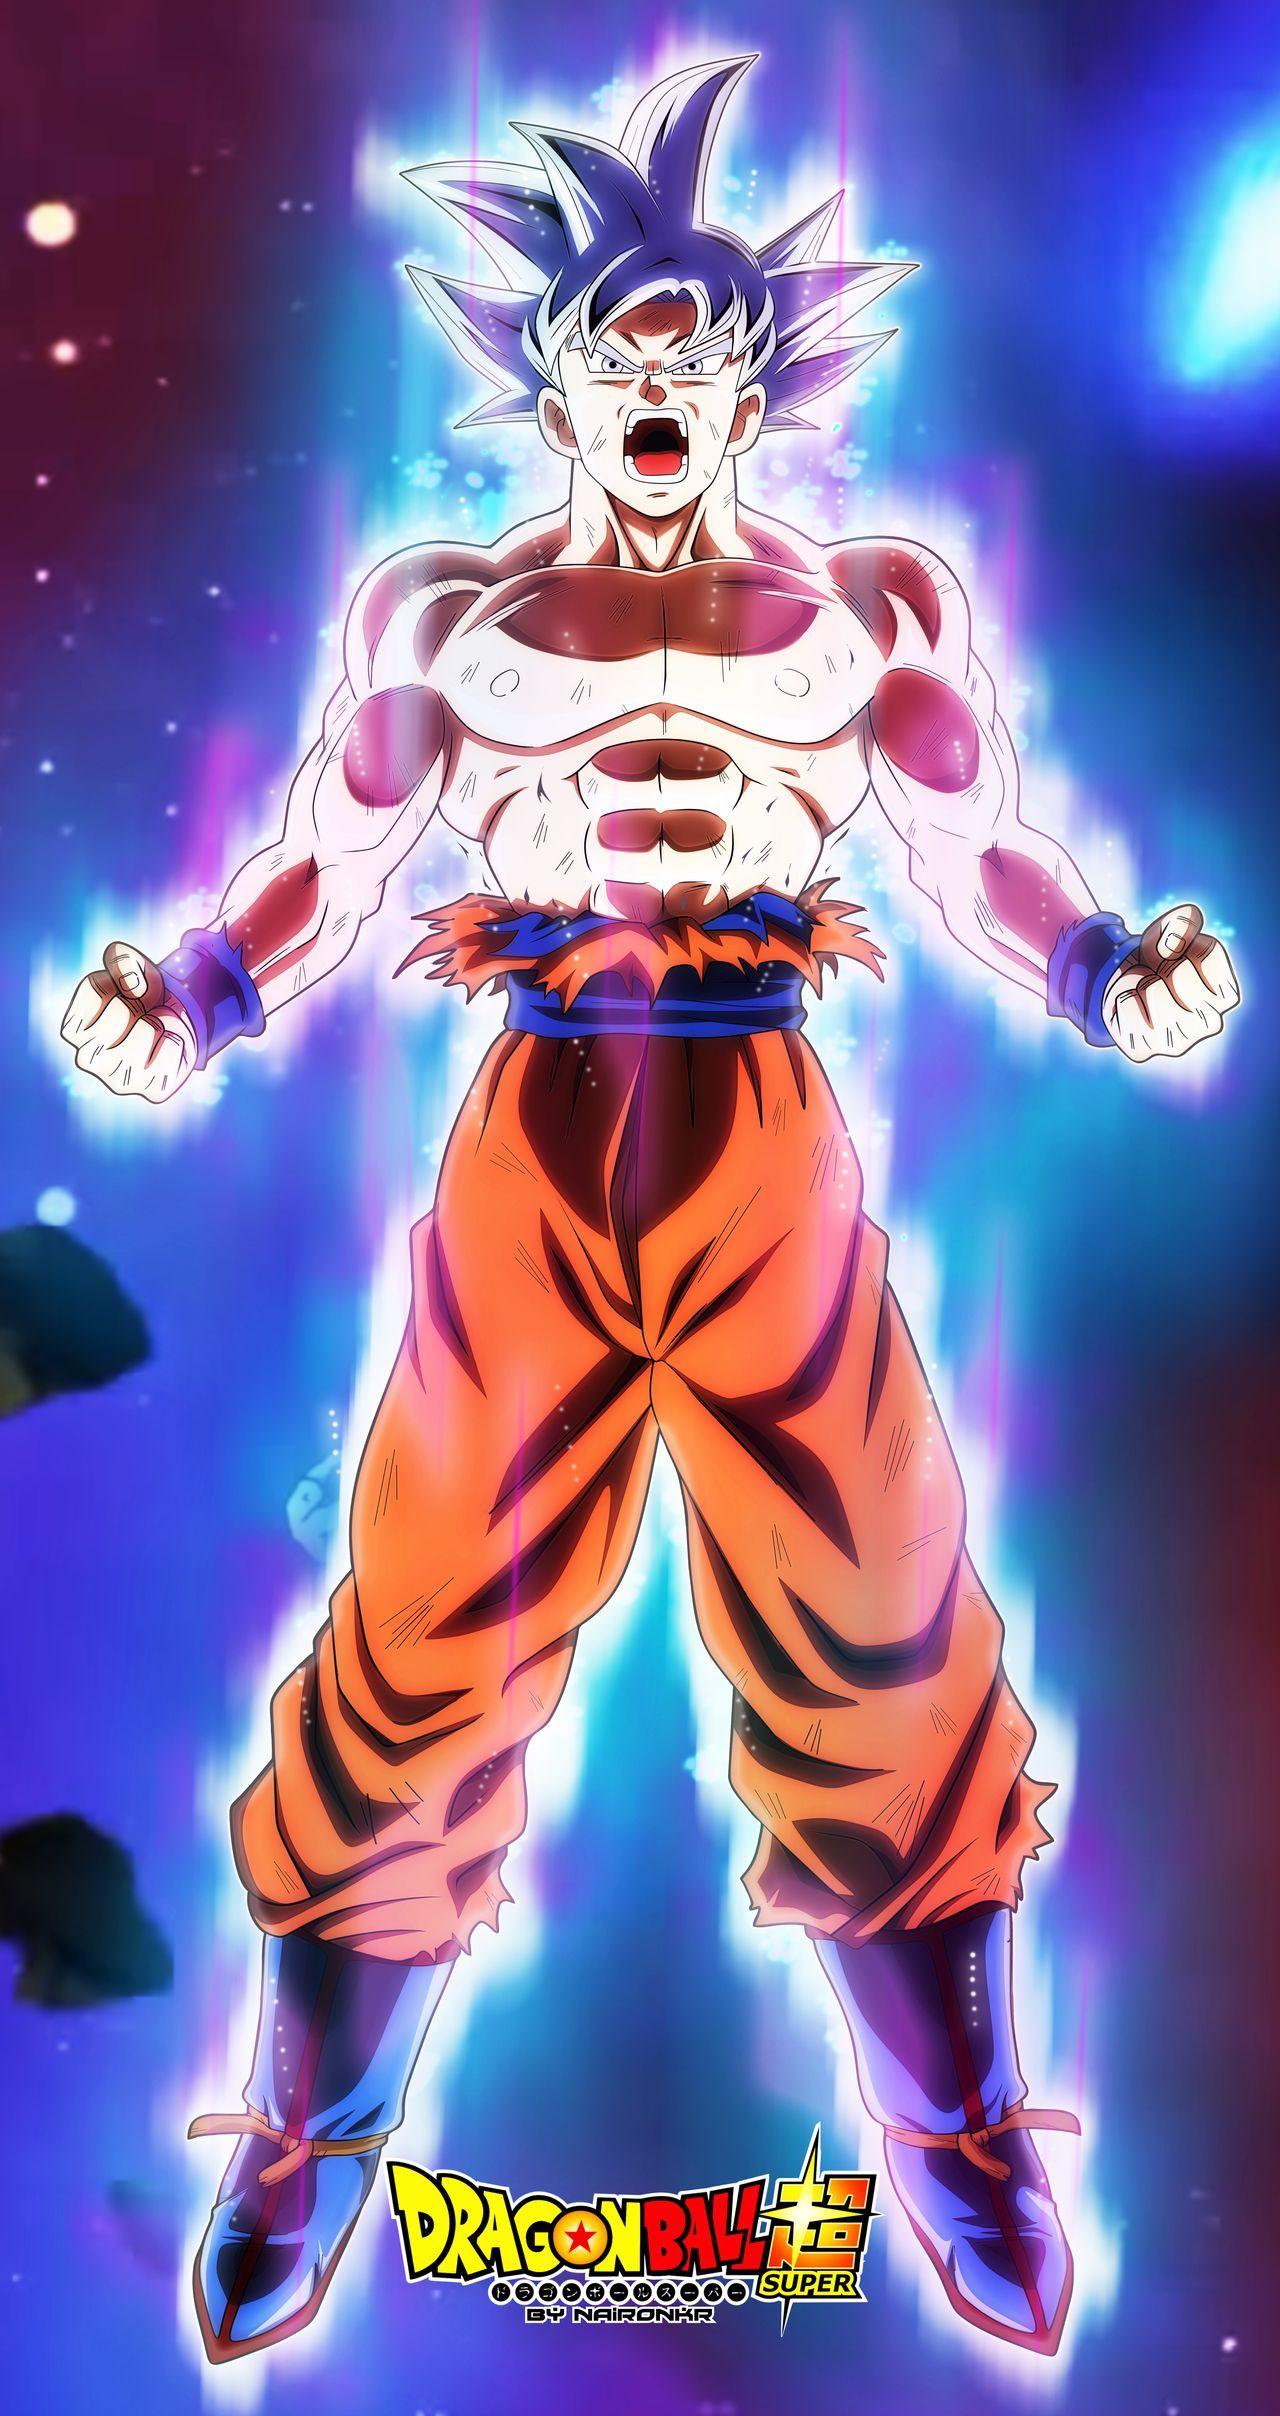 Dragon Ball Super Goku Migatte No Gokui By Naironkr On Deviantart Anime Dragon Ball Super Dragon Ball Super Artwork Dragon Ball Super Goku